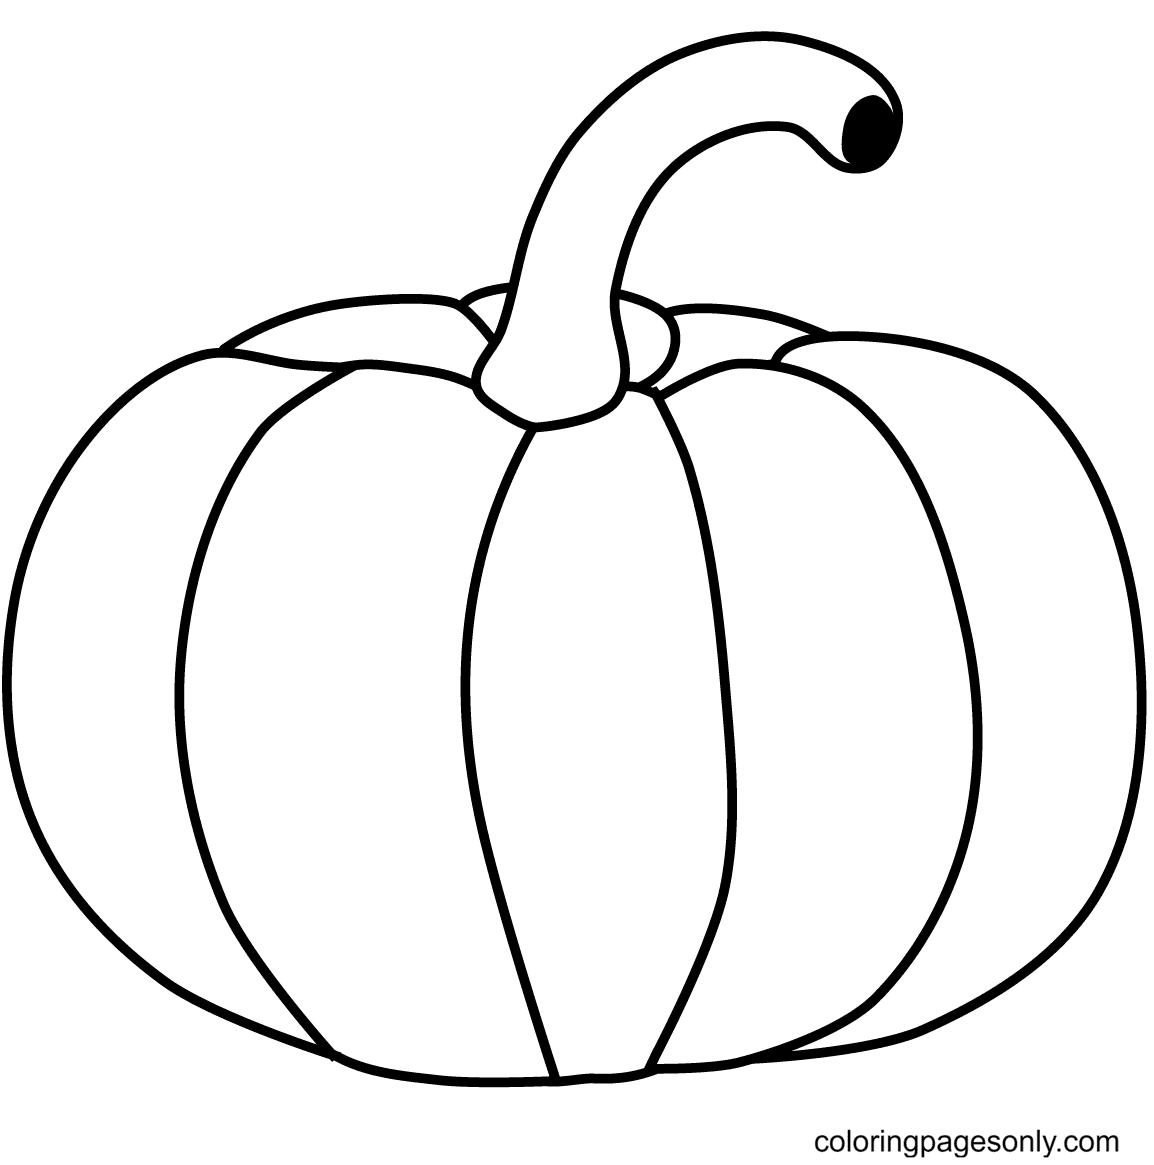 Simple Pumpkin Coloring Page